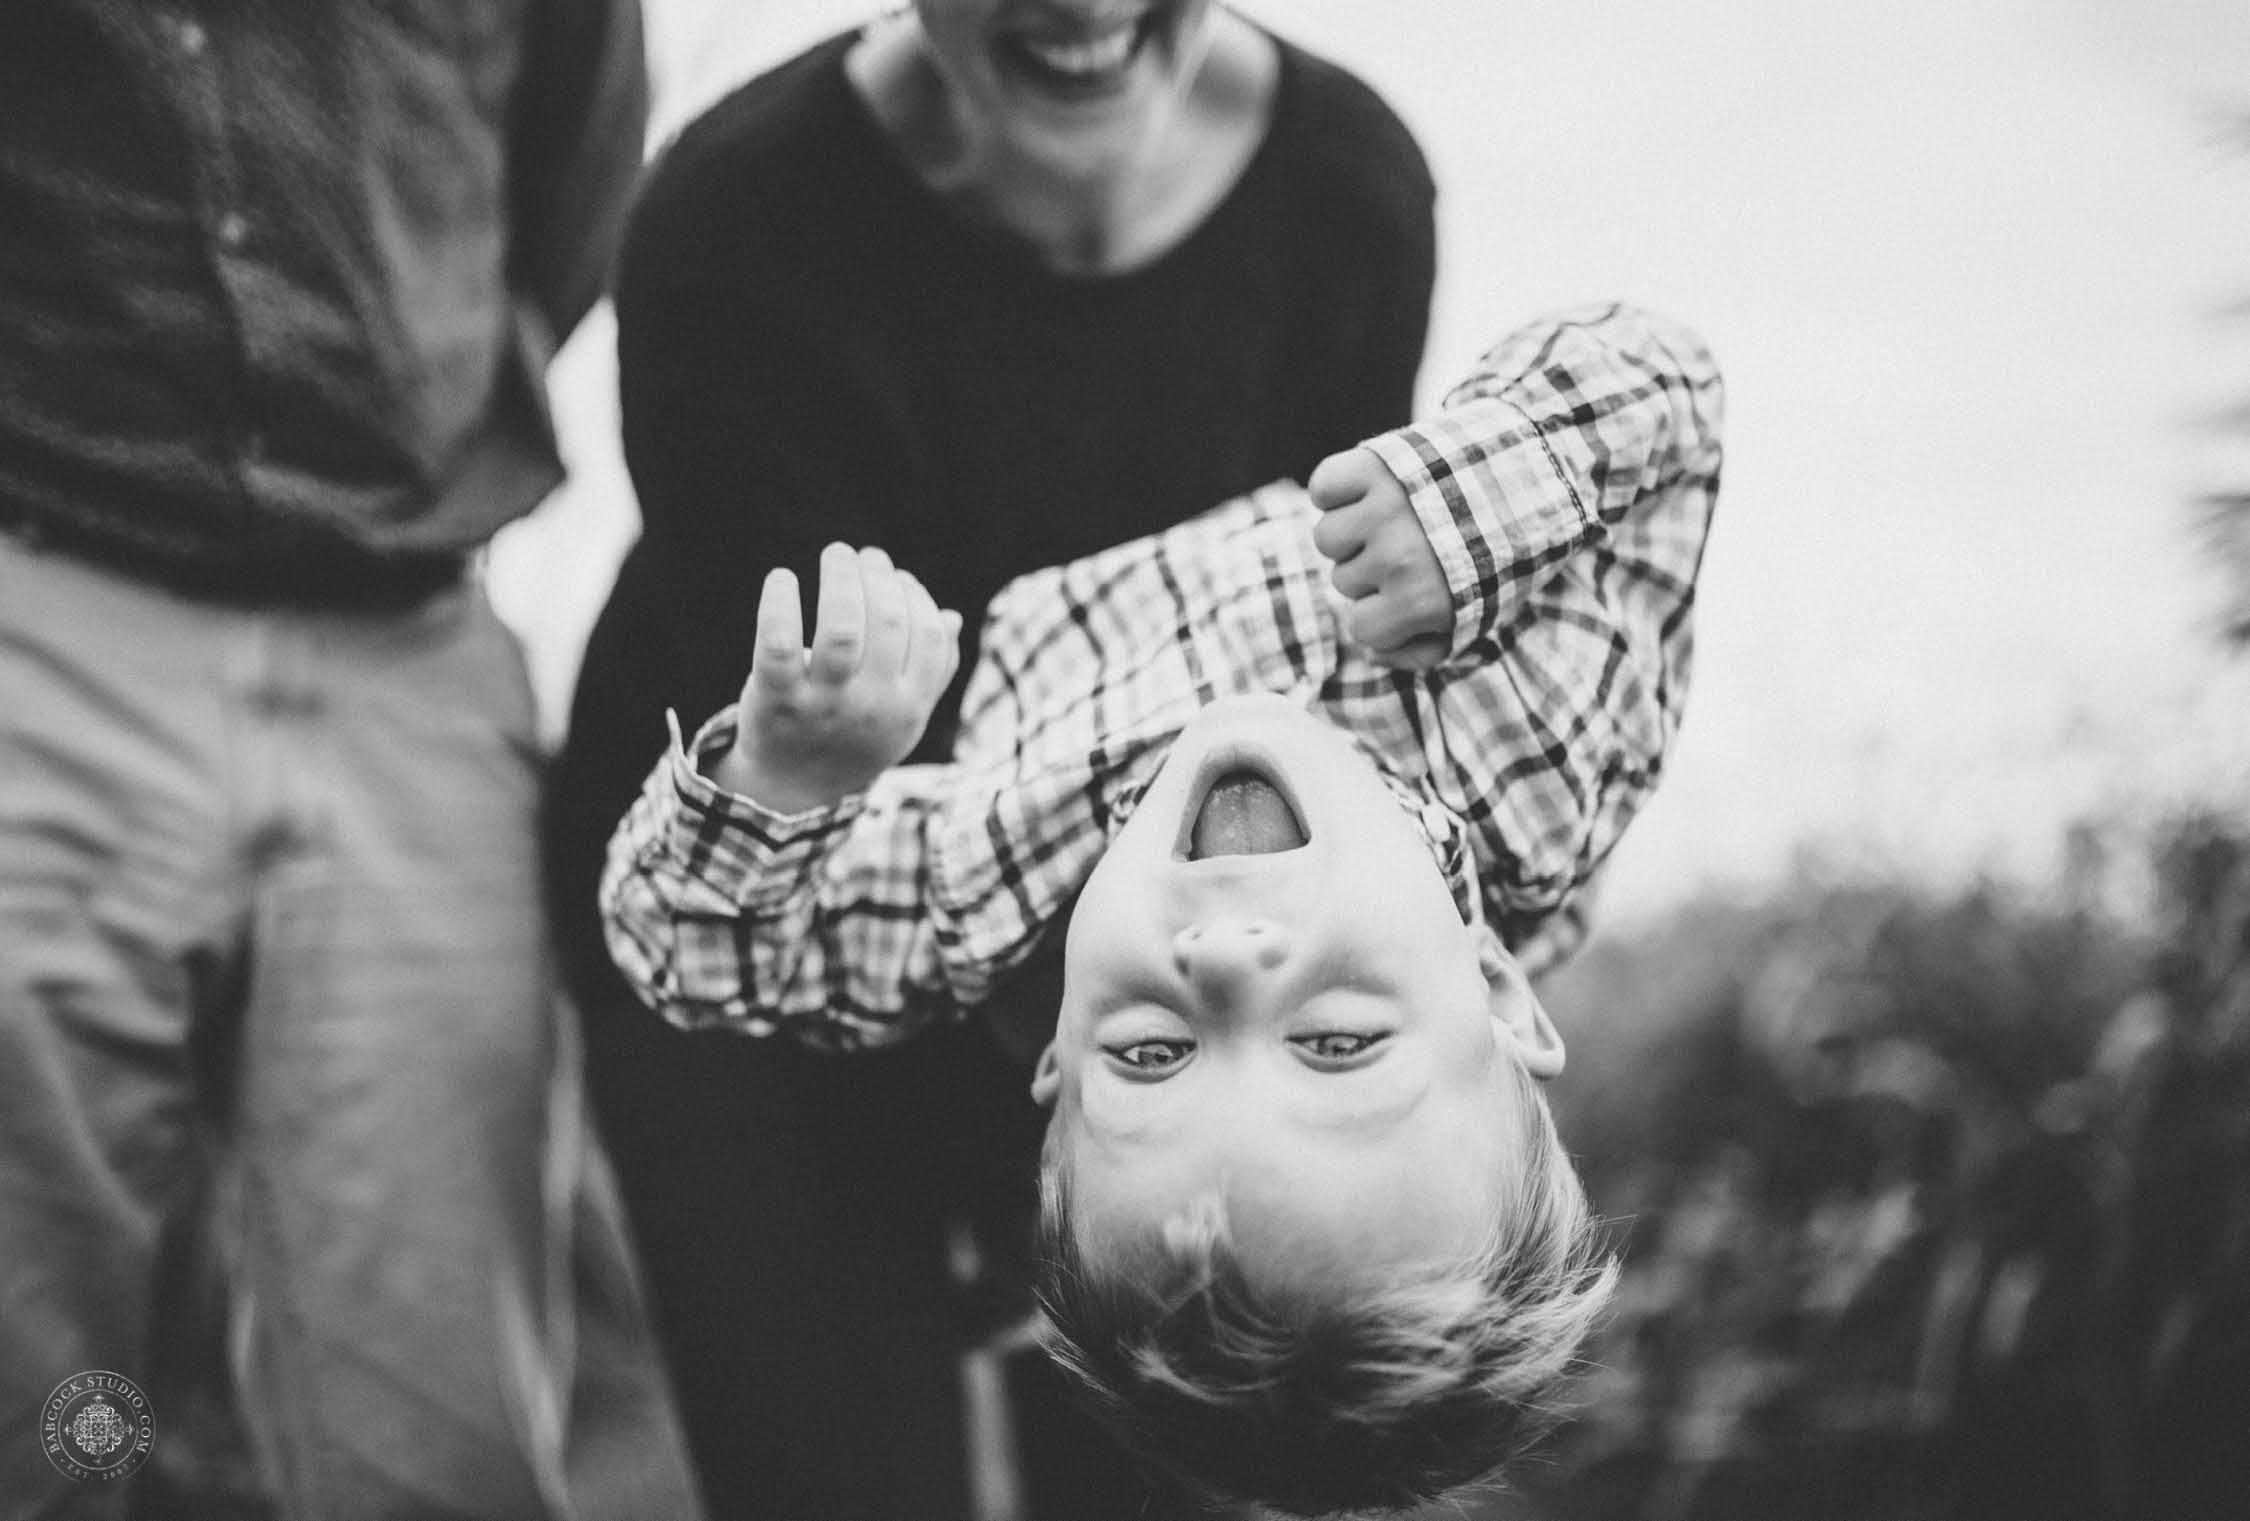 meyer-famly-children-photographer-dayton-ohio-5.jpg